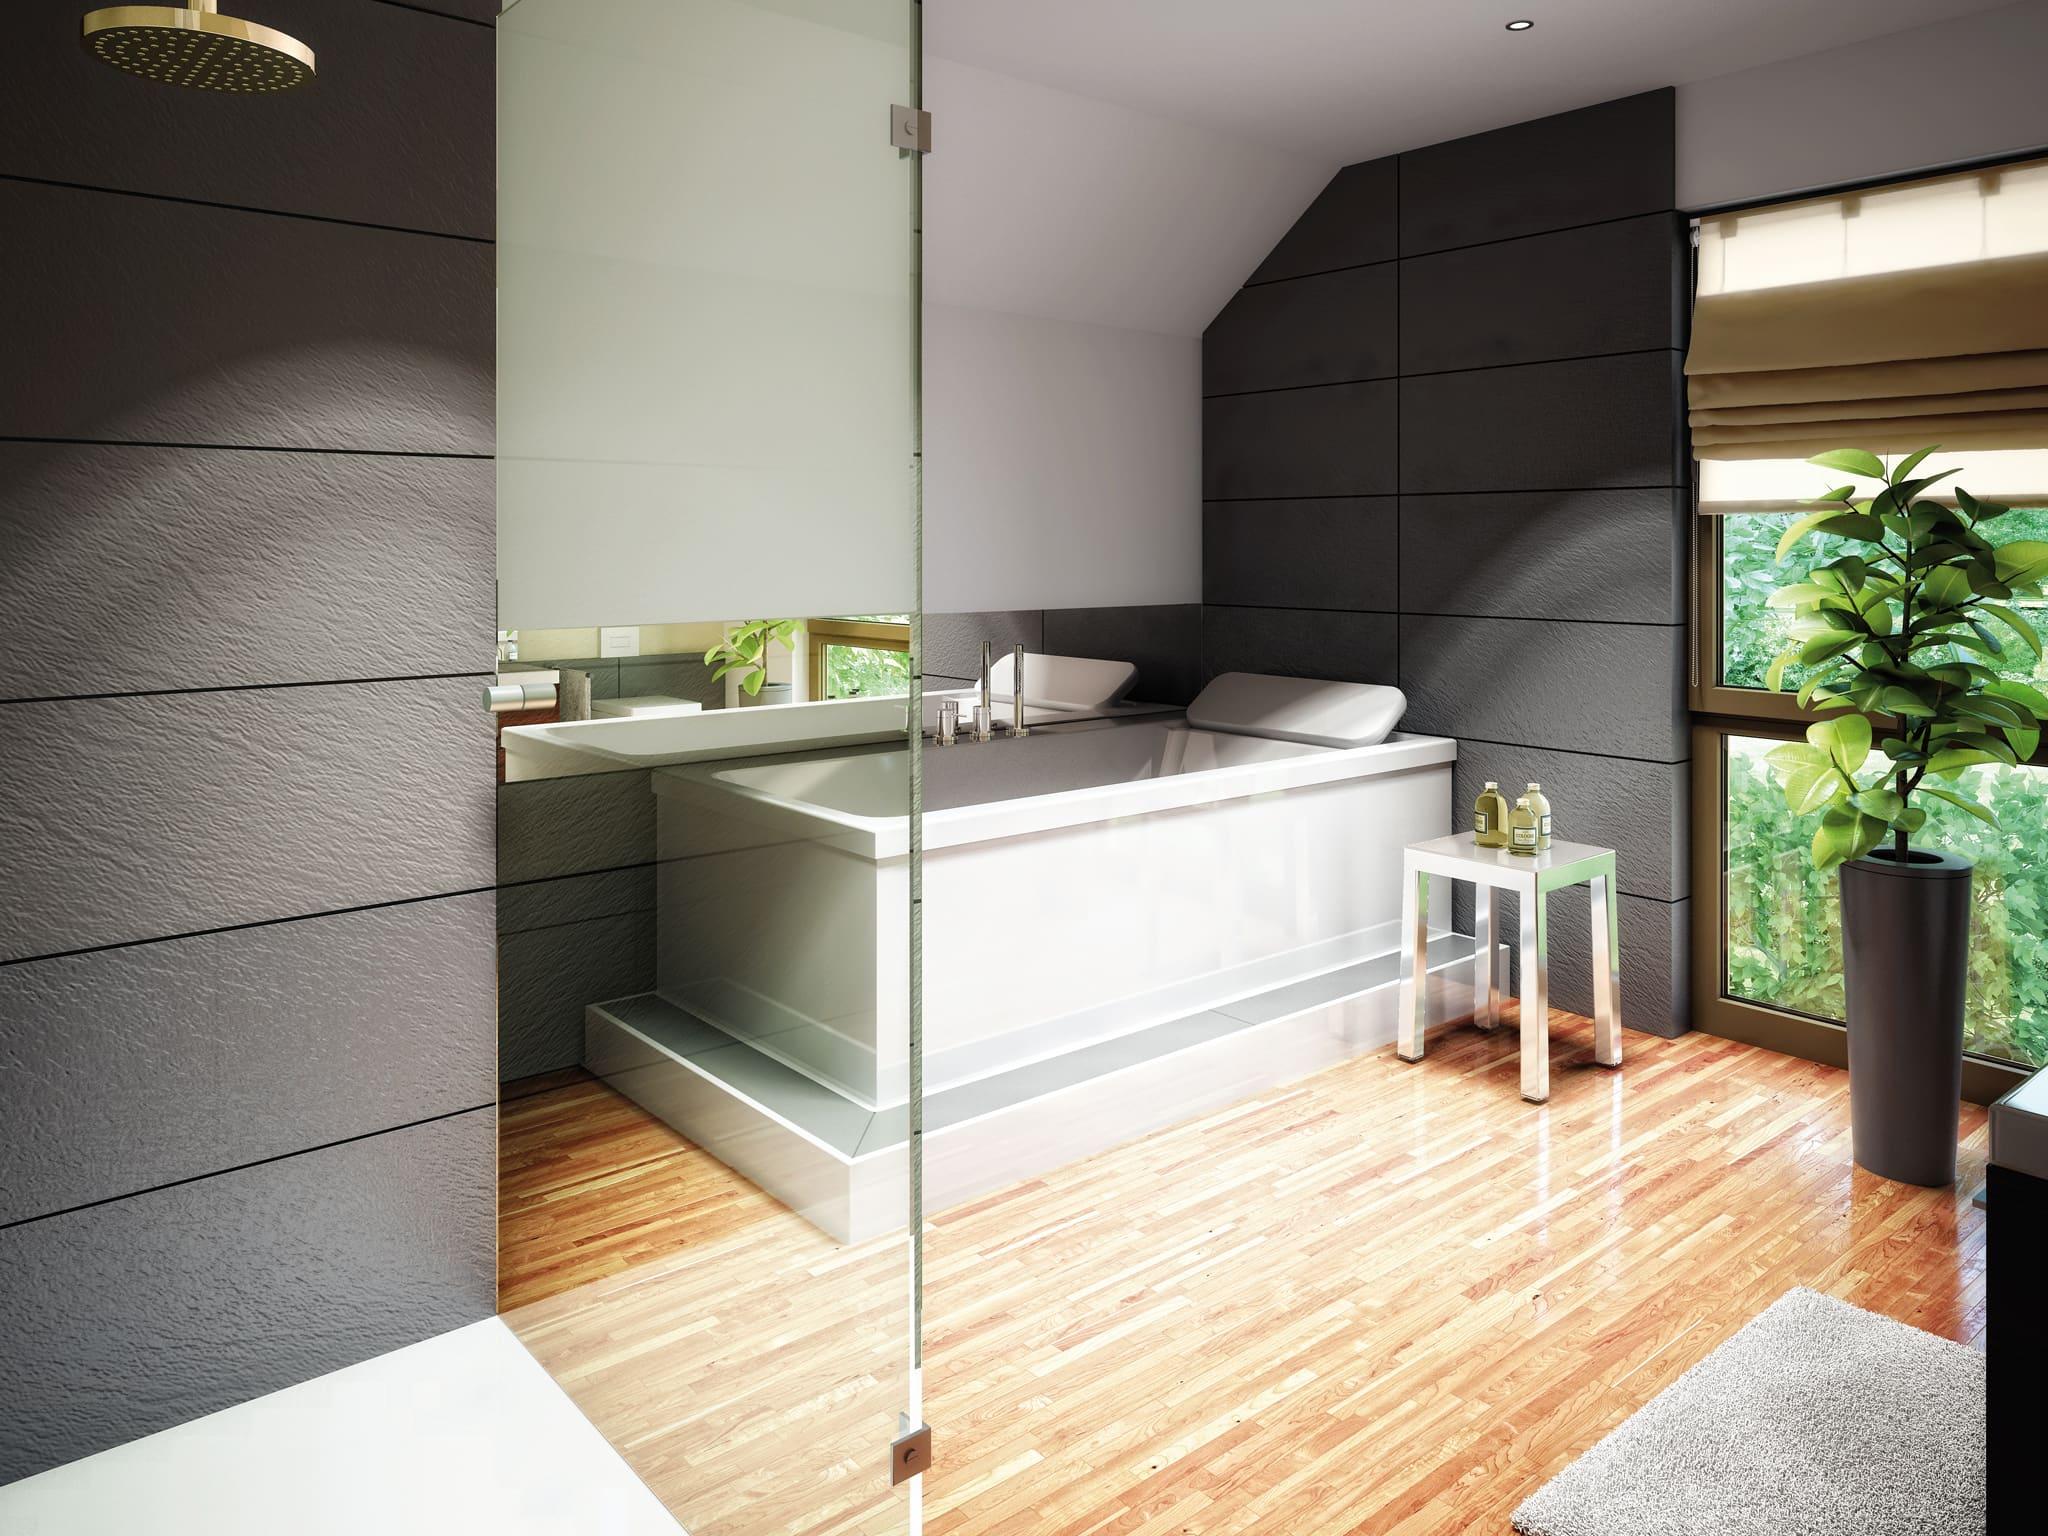 Badezimmer Ideen - Einfamilienhaus Inneneinrichtung Fertighaus Living Haus SUNSHINE 126 V5 - HausbauDirekt.de